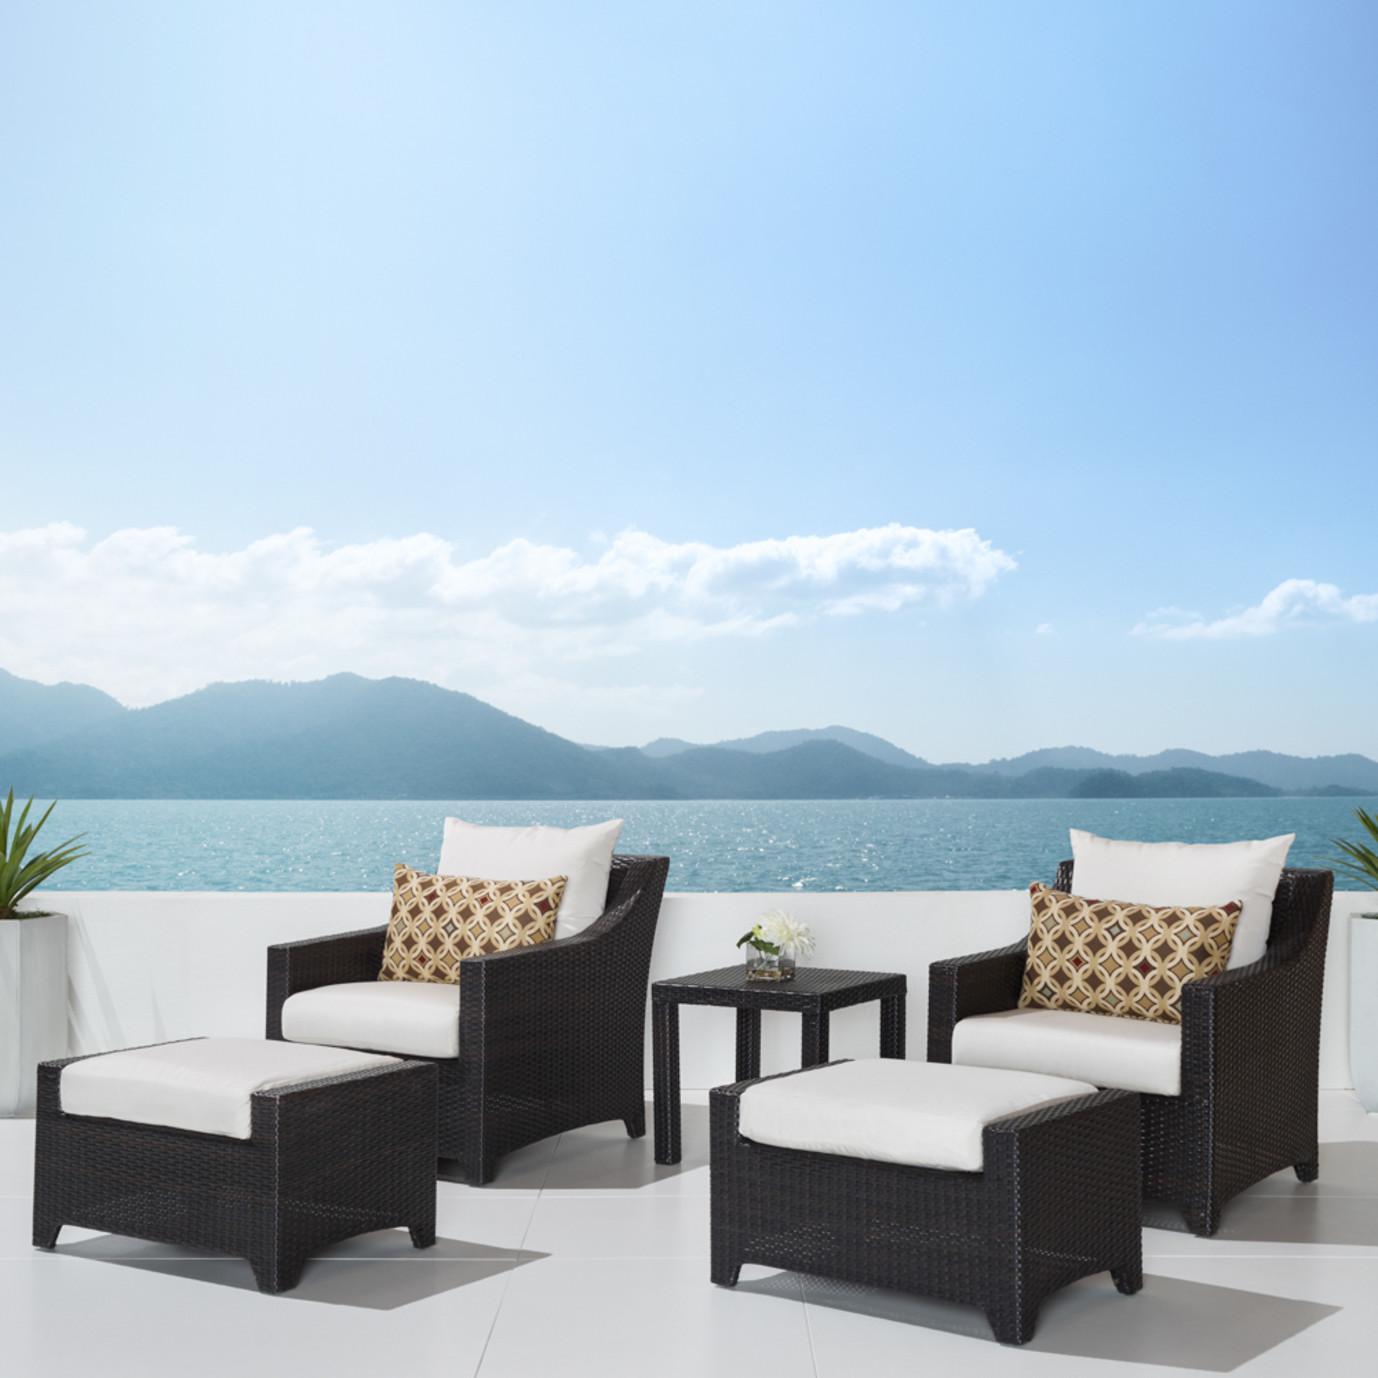 Deco™ 5pc Club Chair and Ottoman Set - Moroccan Cream